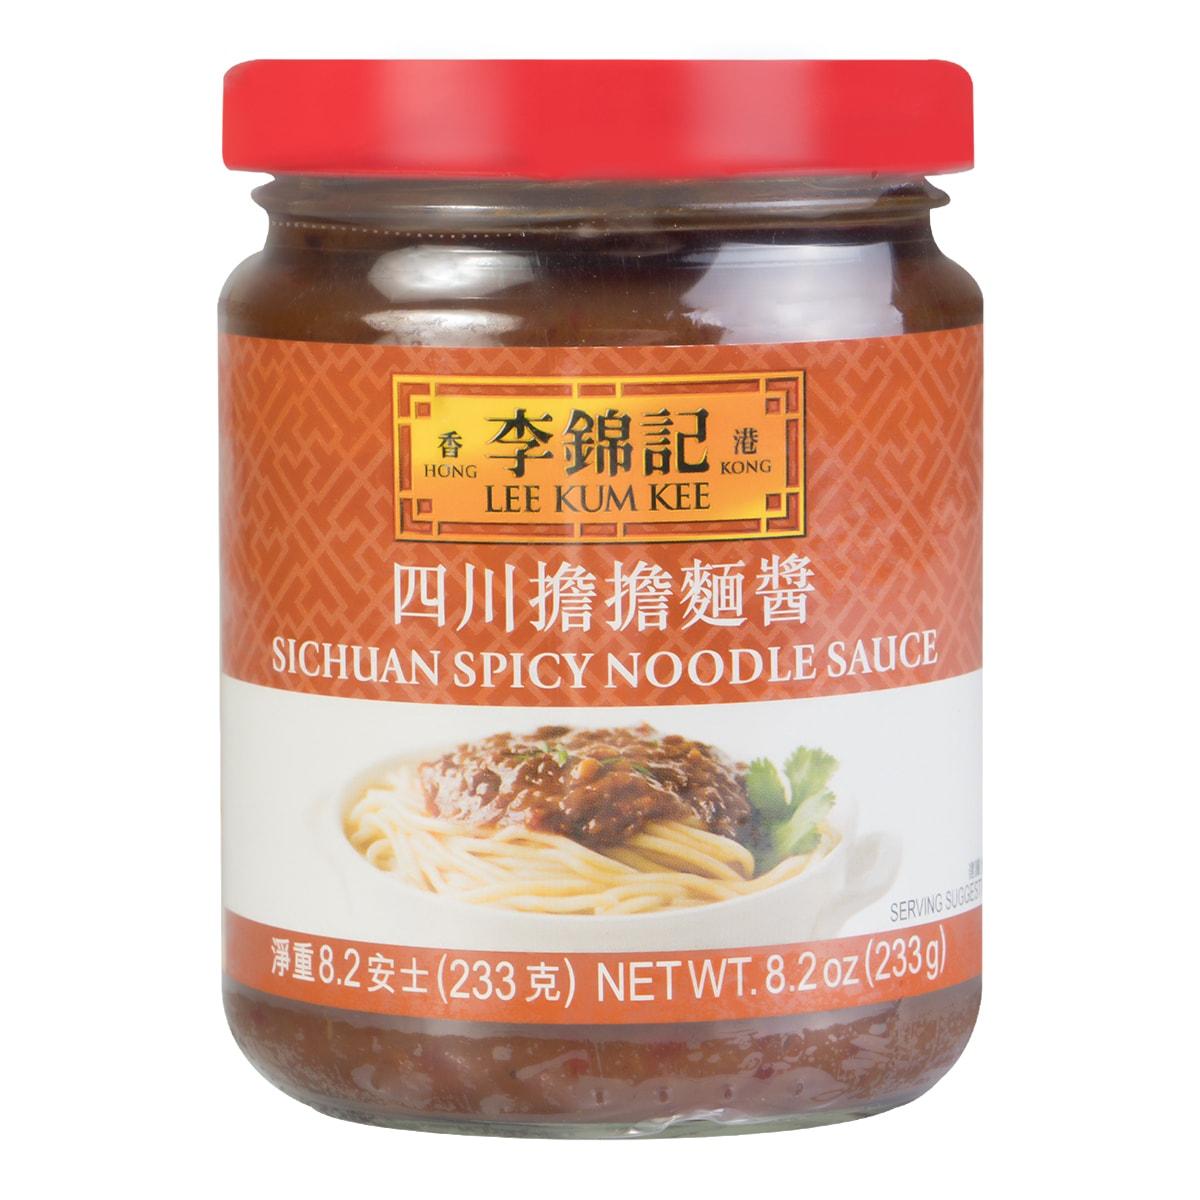 LEE KUM KEE Szechuan Spicy noodle Sauce 233g